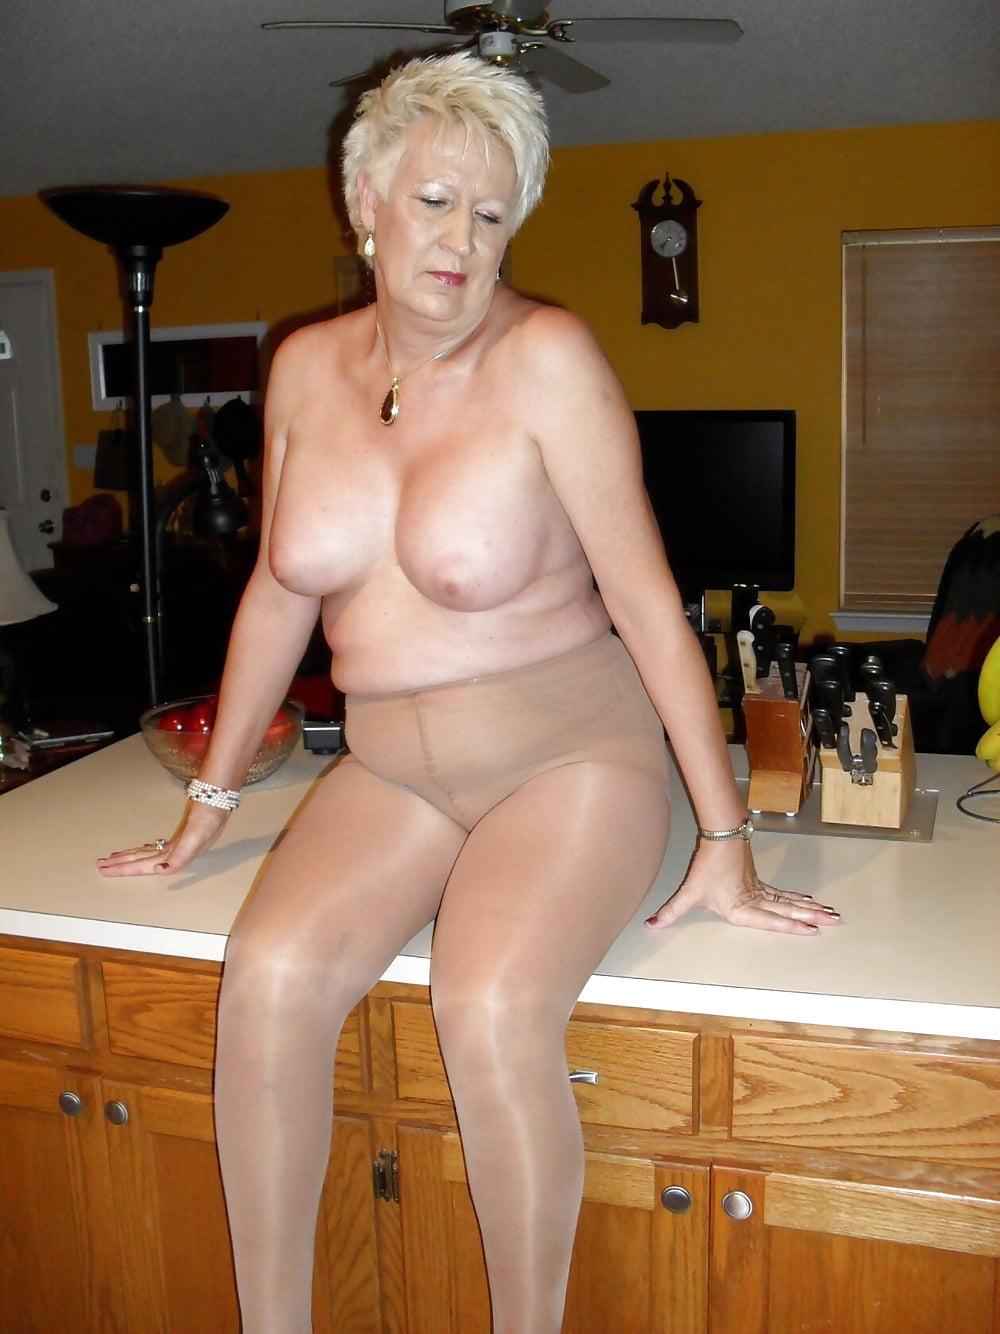 Xhamster pantyhose whores - Nude photos